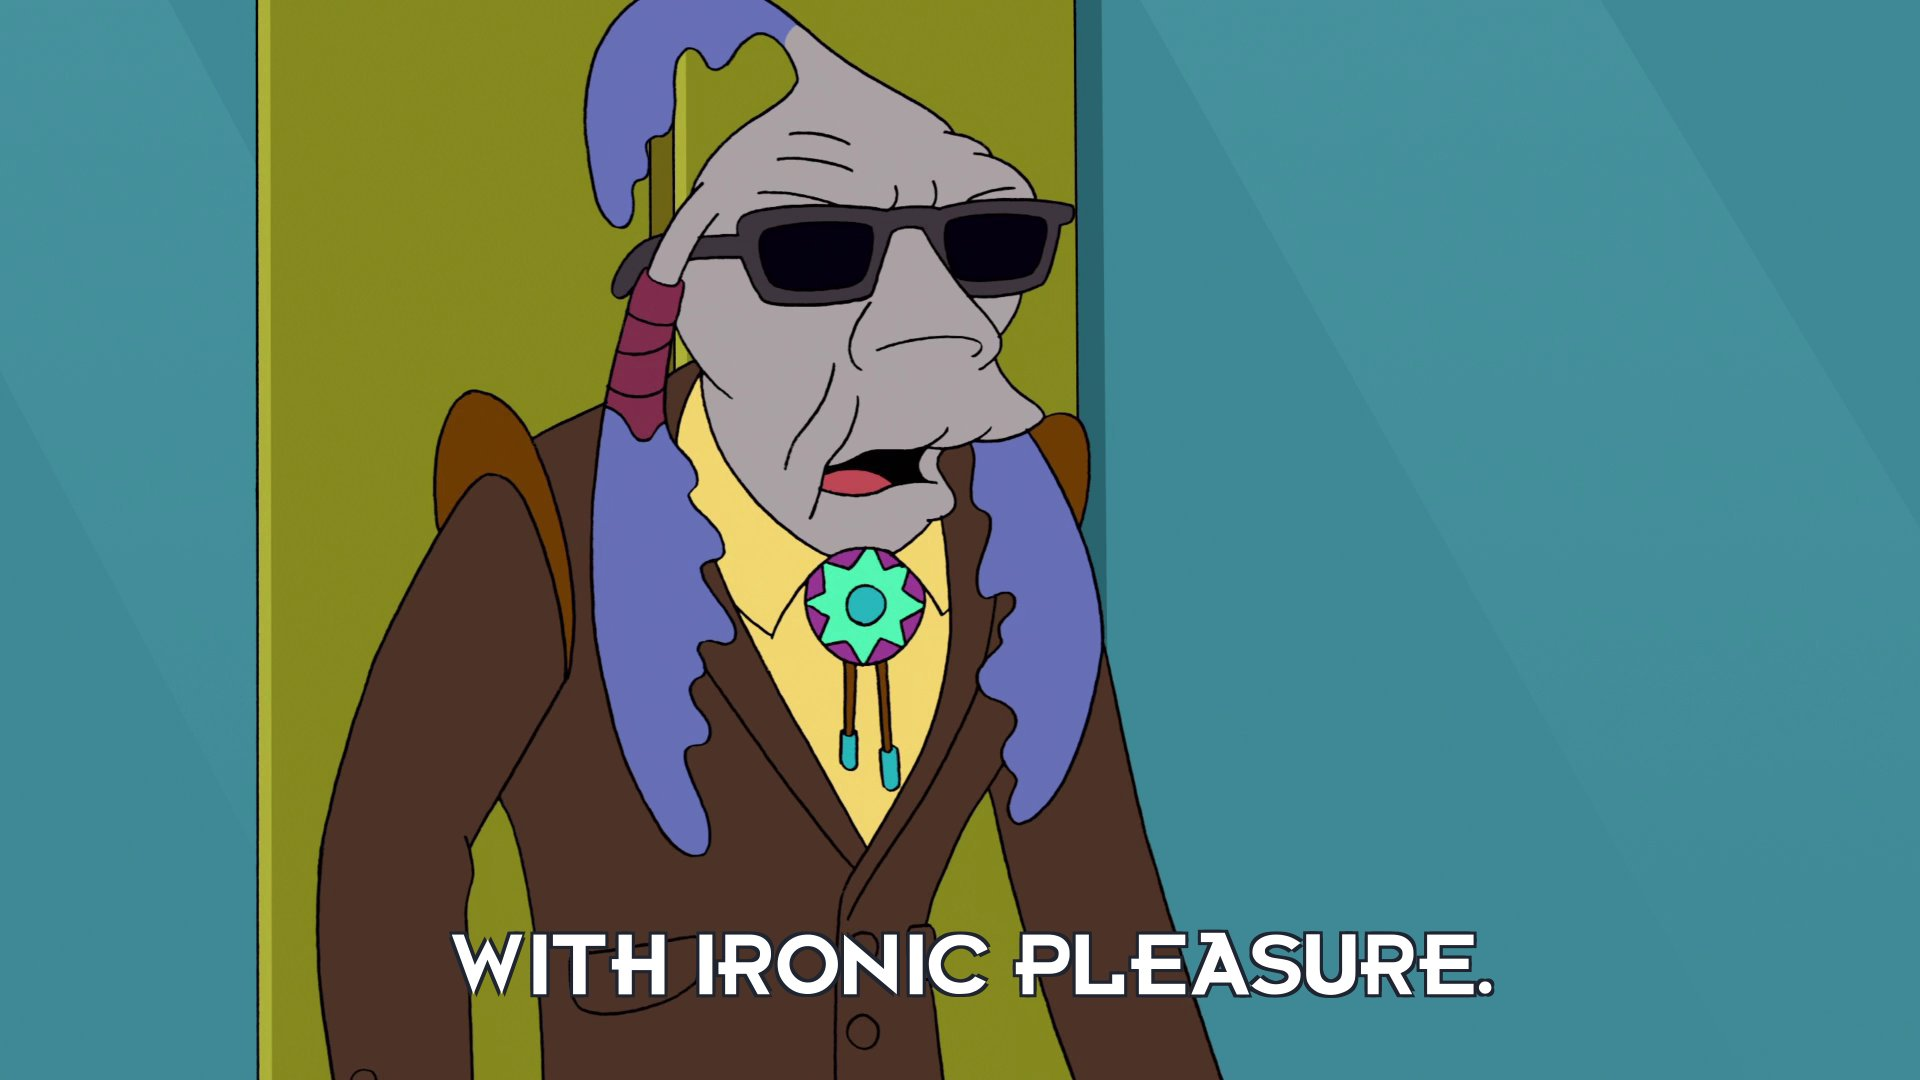 Blind Joe: With ironic pleasure.